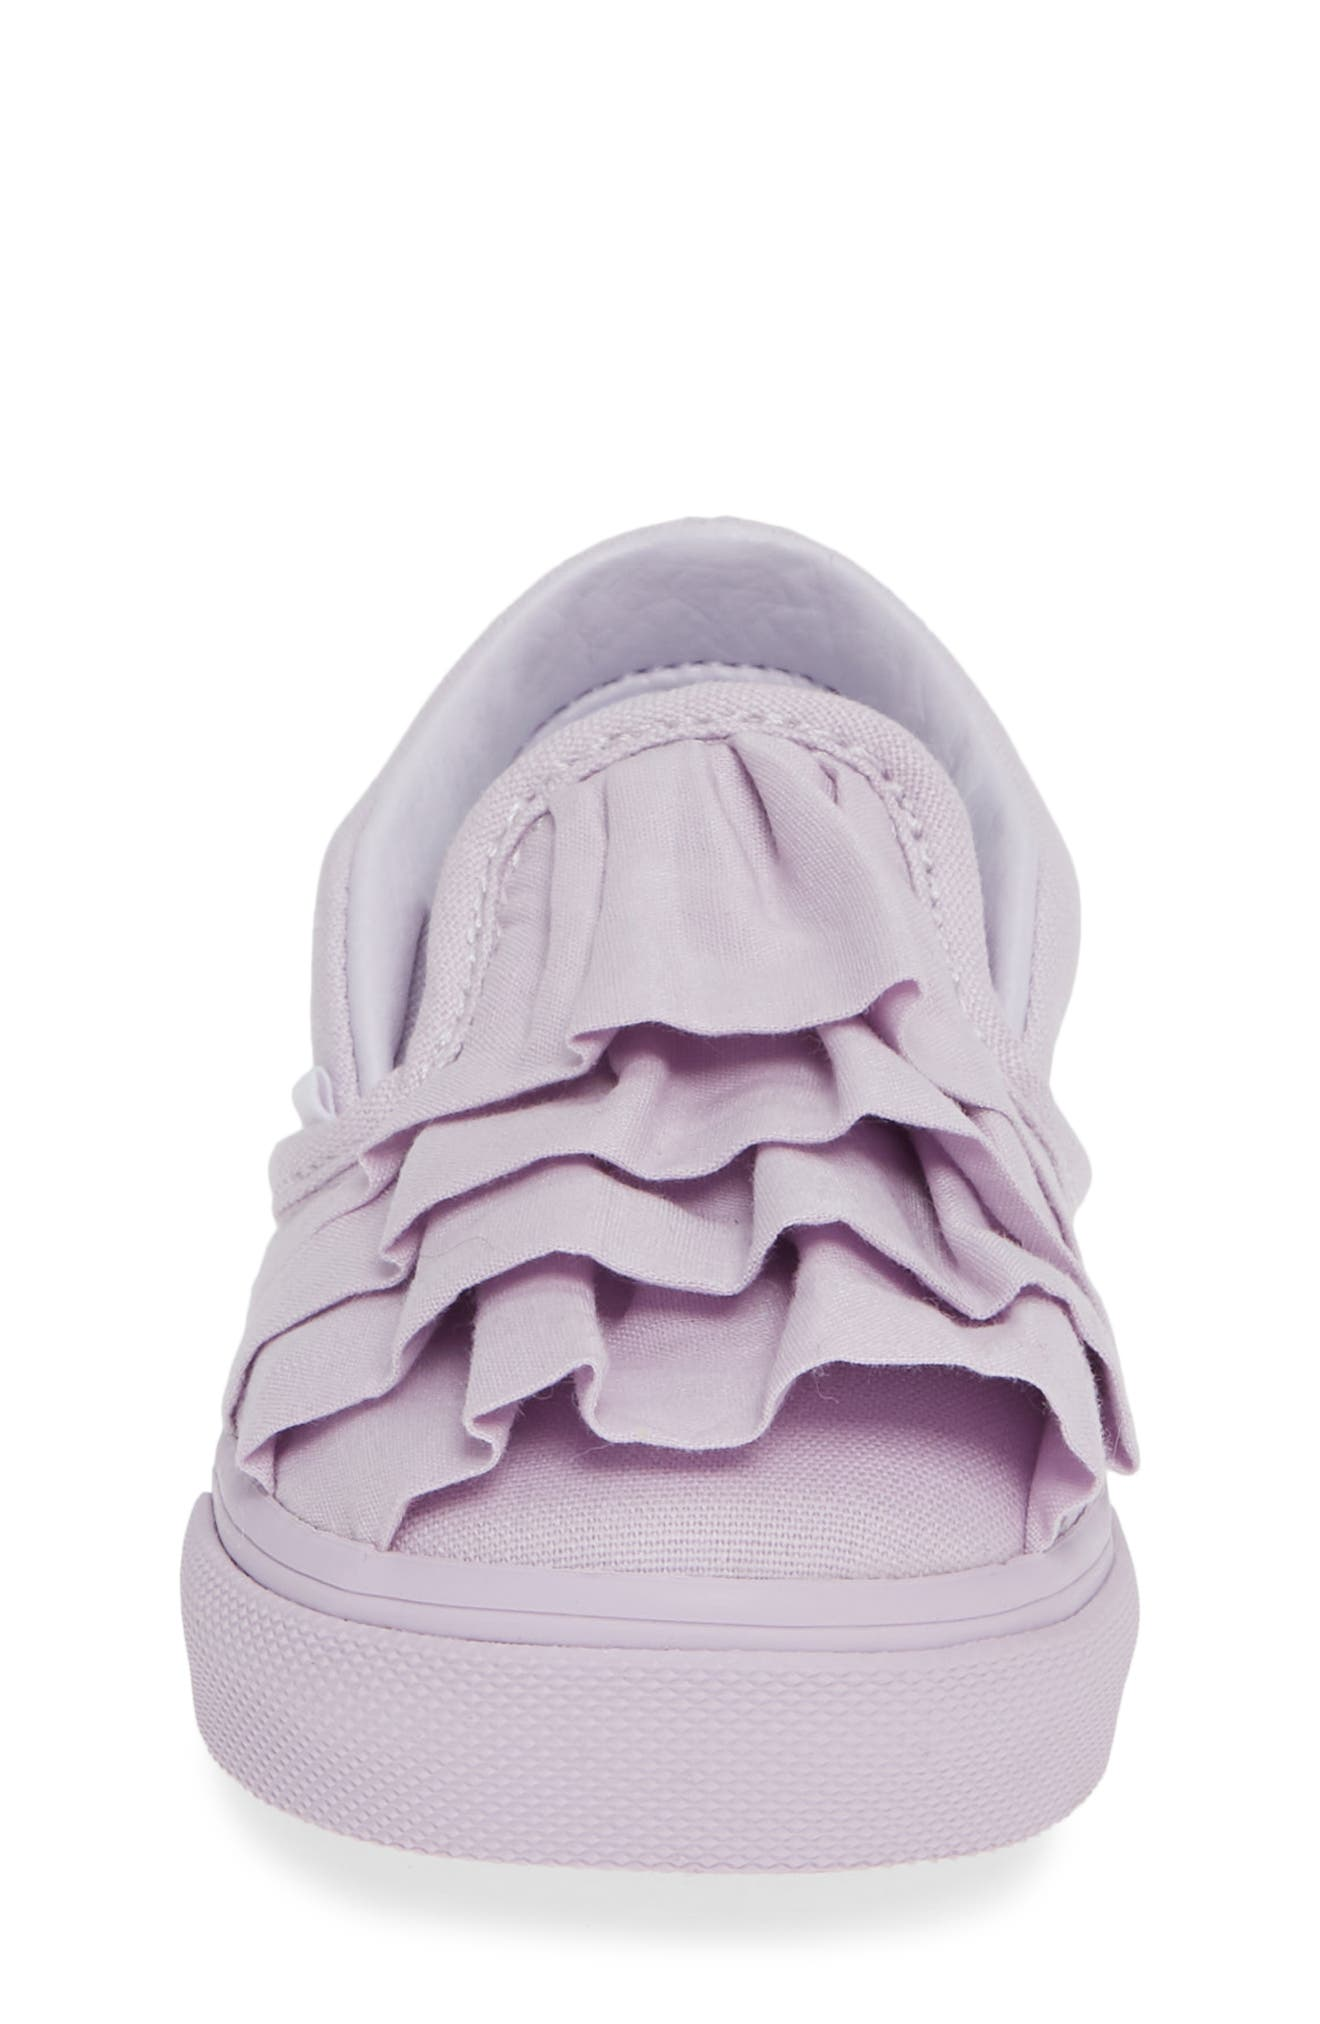 Ruffle Classic Slip-On Sneaker,                             Alternate thumbnail 4, color,                             530